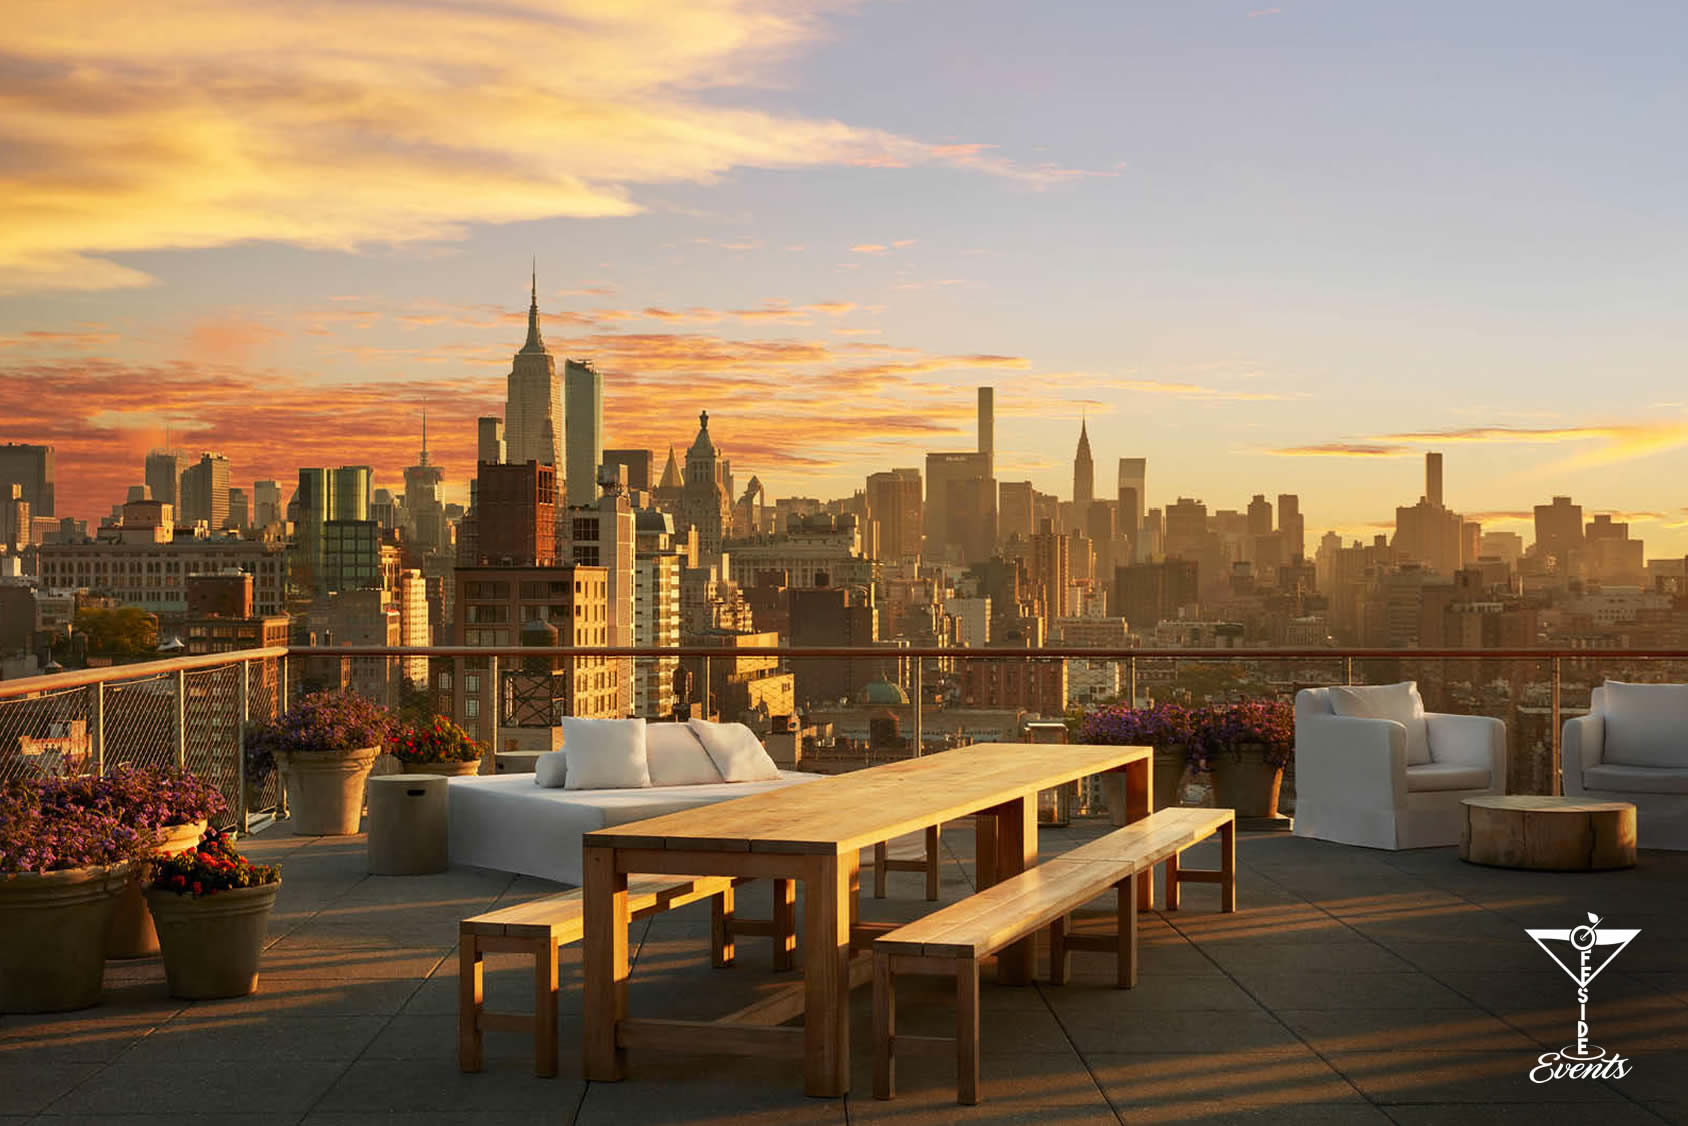 Gli Skybar nel mondo- the roof NY, Temple bar, open bar